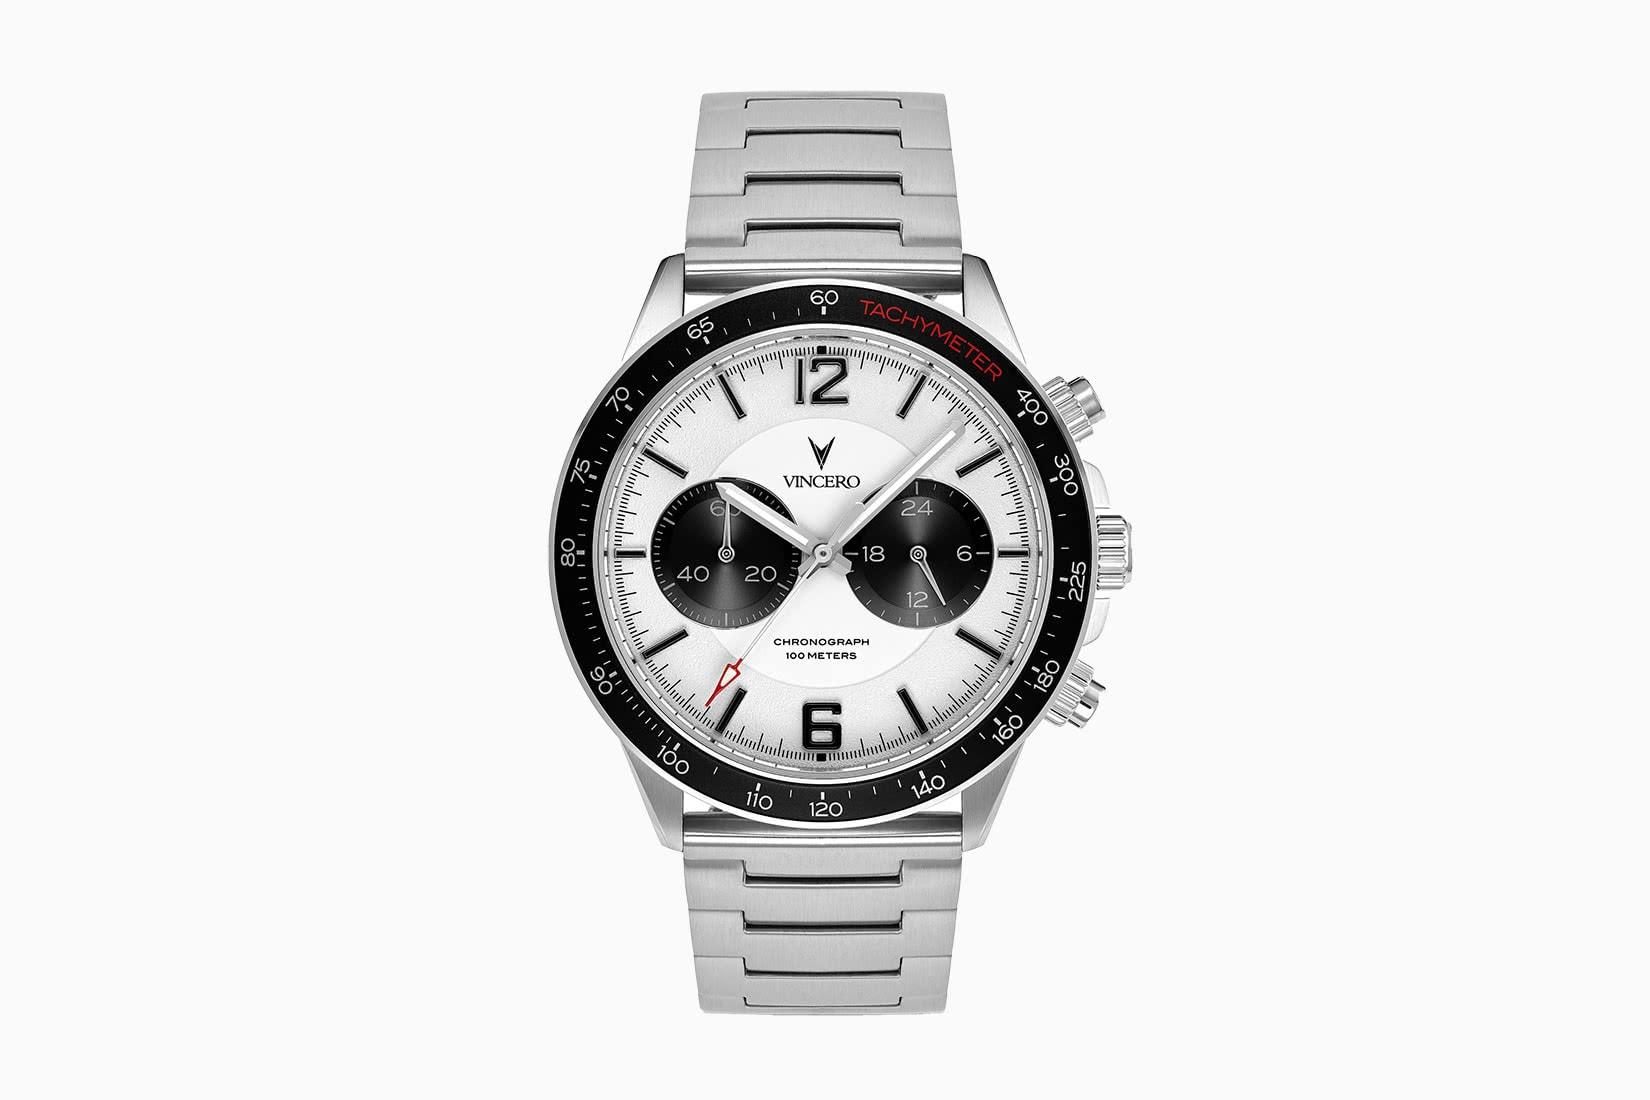 best men watches vincero the apex review - Luxe Digital